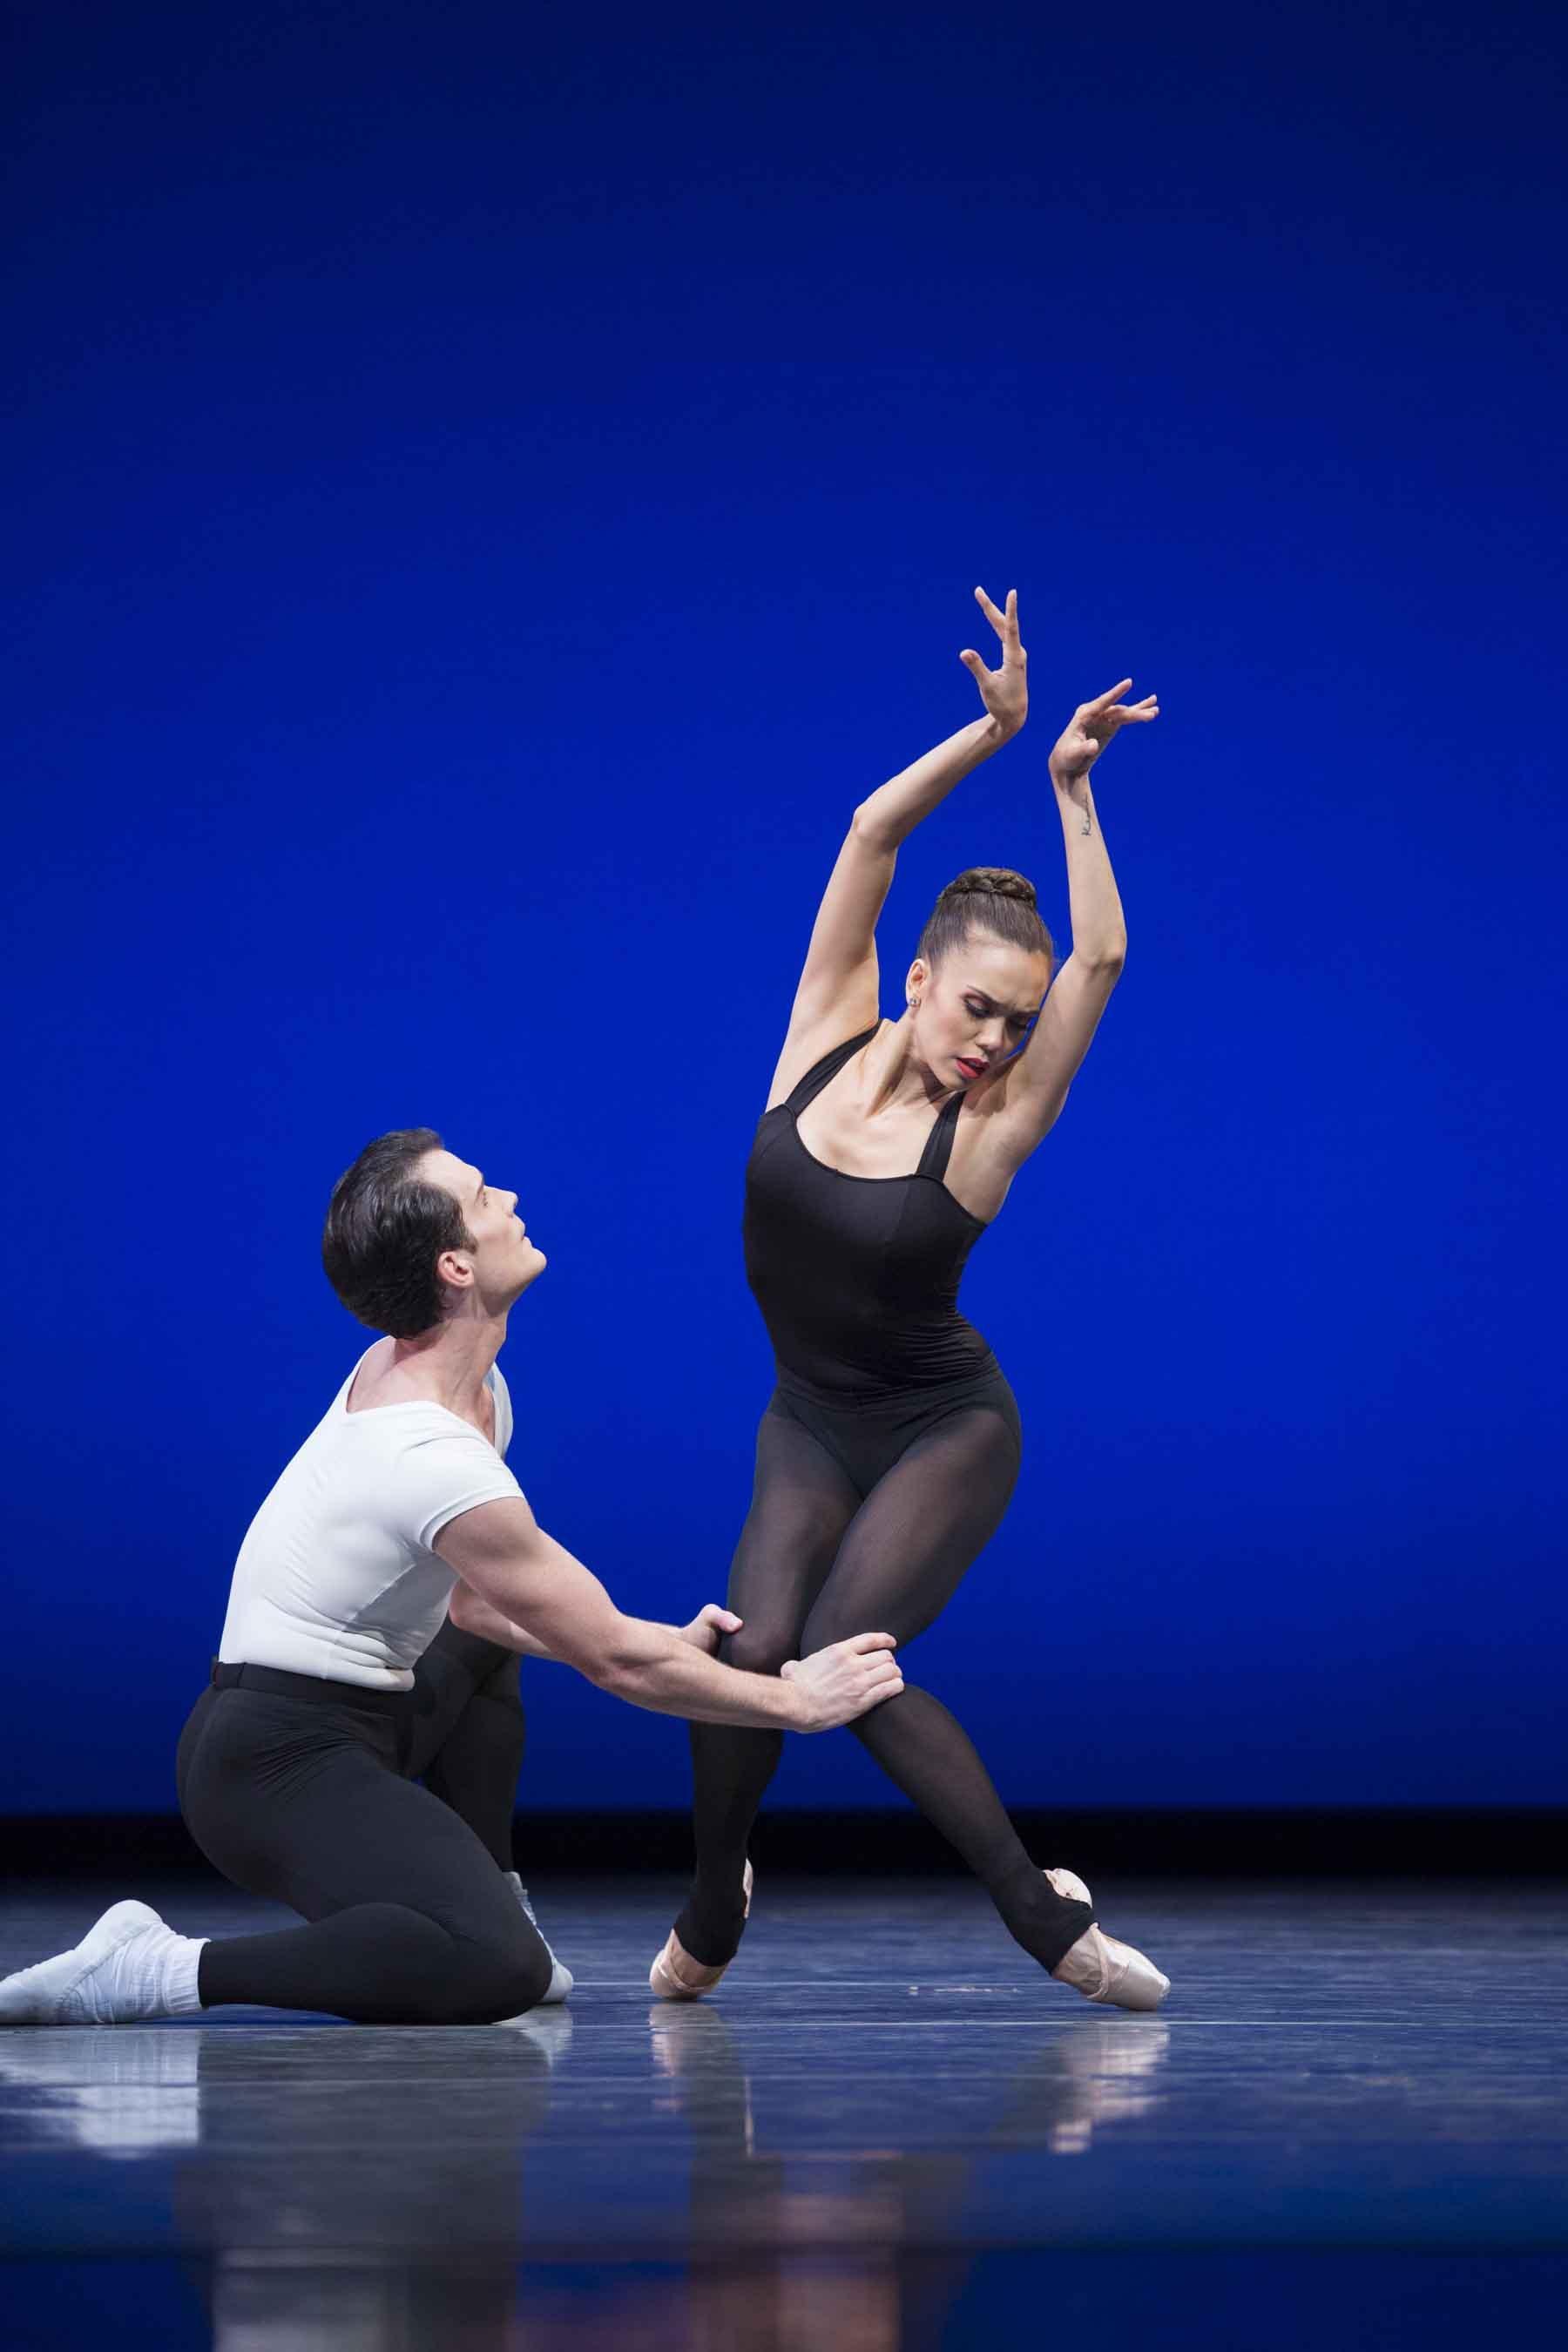 Seth Orza and Noelani Pantastico in Balanchine's Stravinsky Violin Concerto. Photo © Angela Sterling